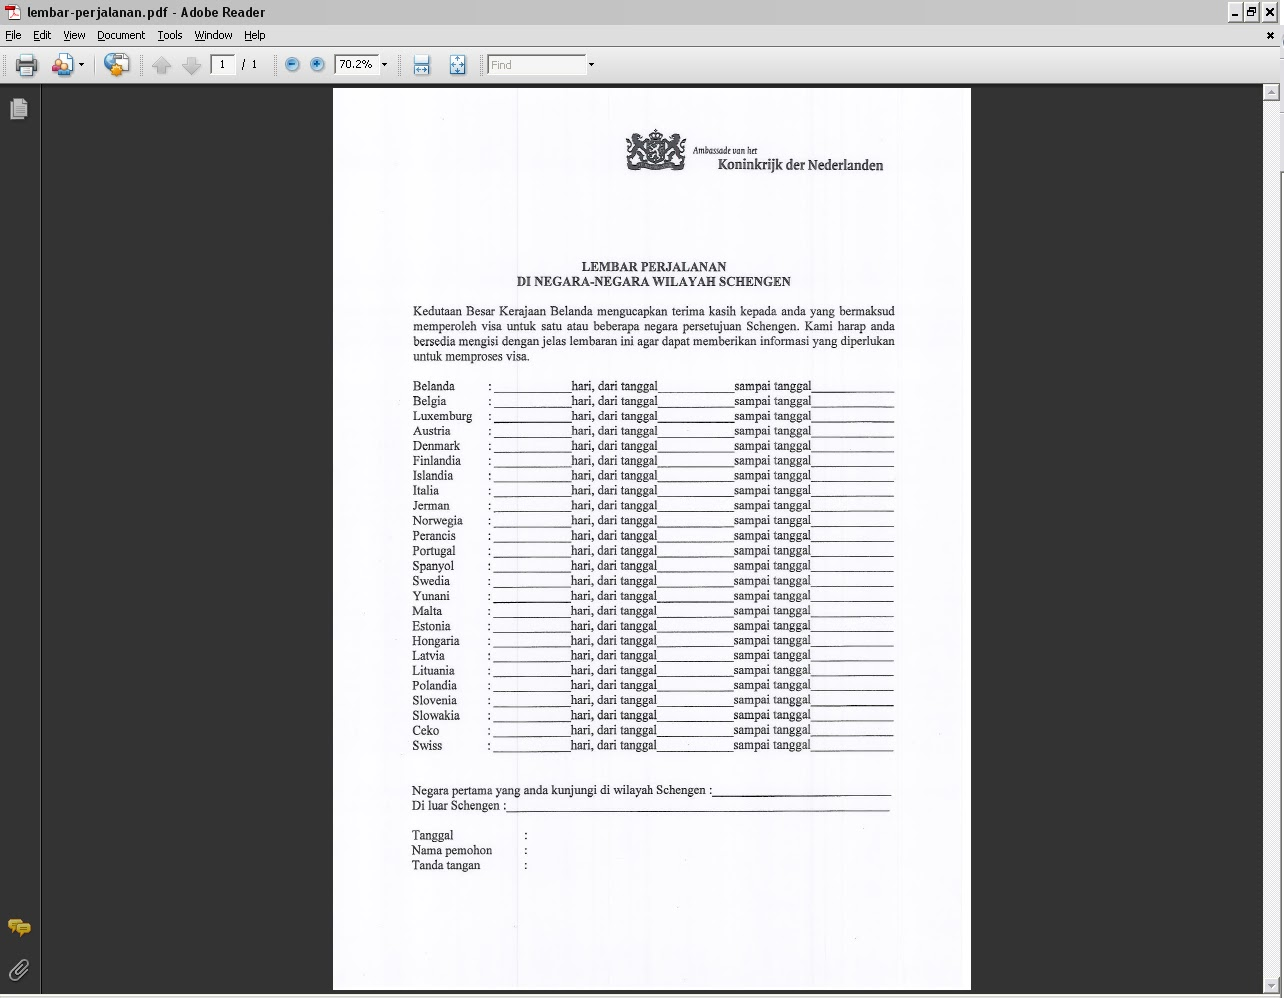 Travel Document More About Applying Schengen Visa In